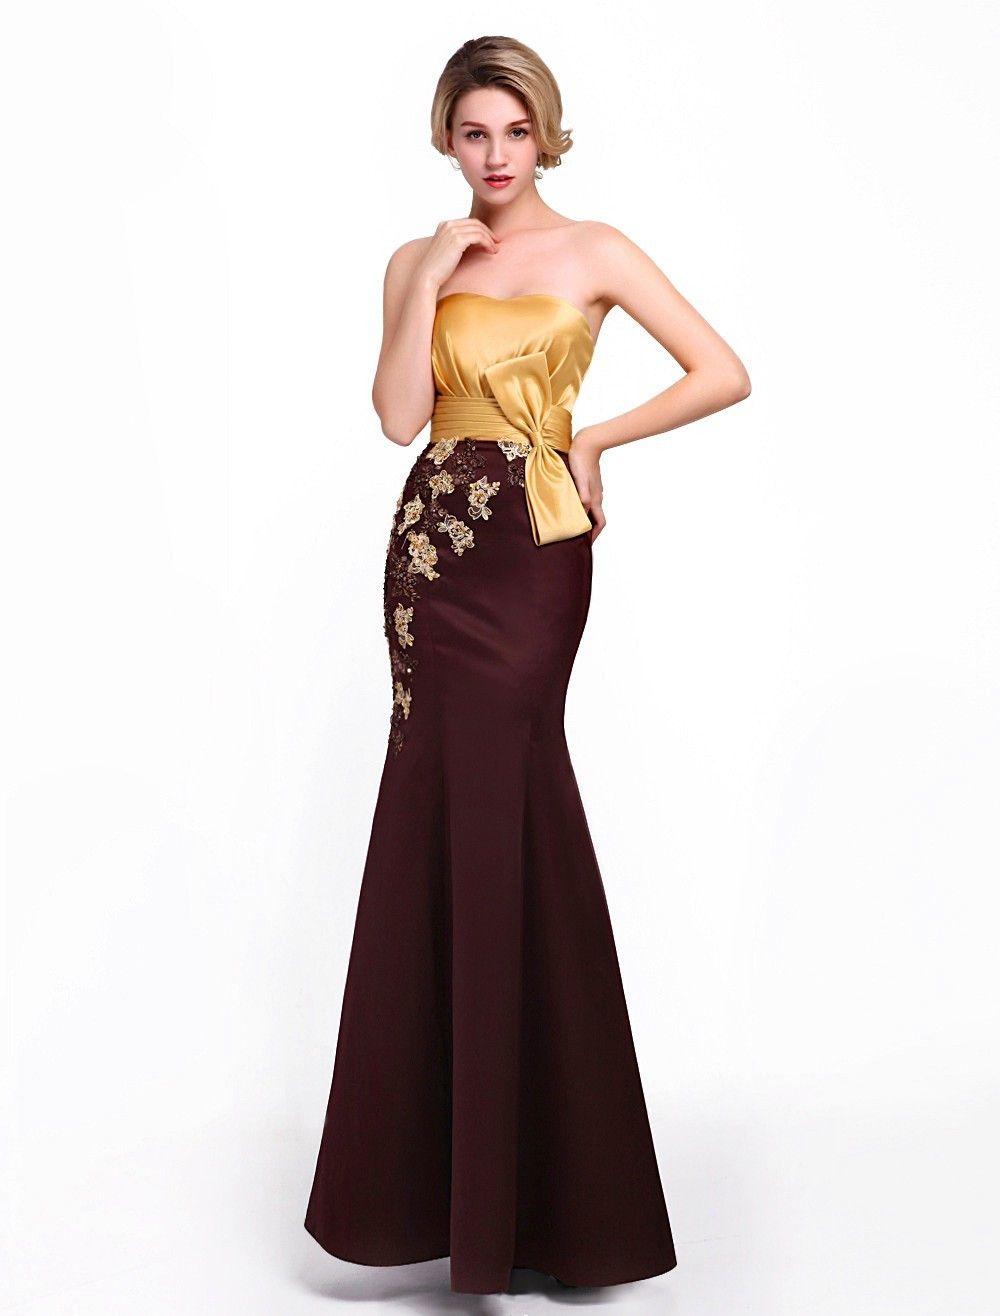 Brown Bow Strapless Floor Length Trumpet Mermaid Evening Prom Dress Cwb0043 $215 Mermaid Evening Dresses